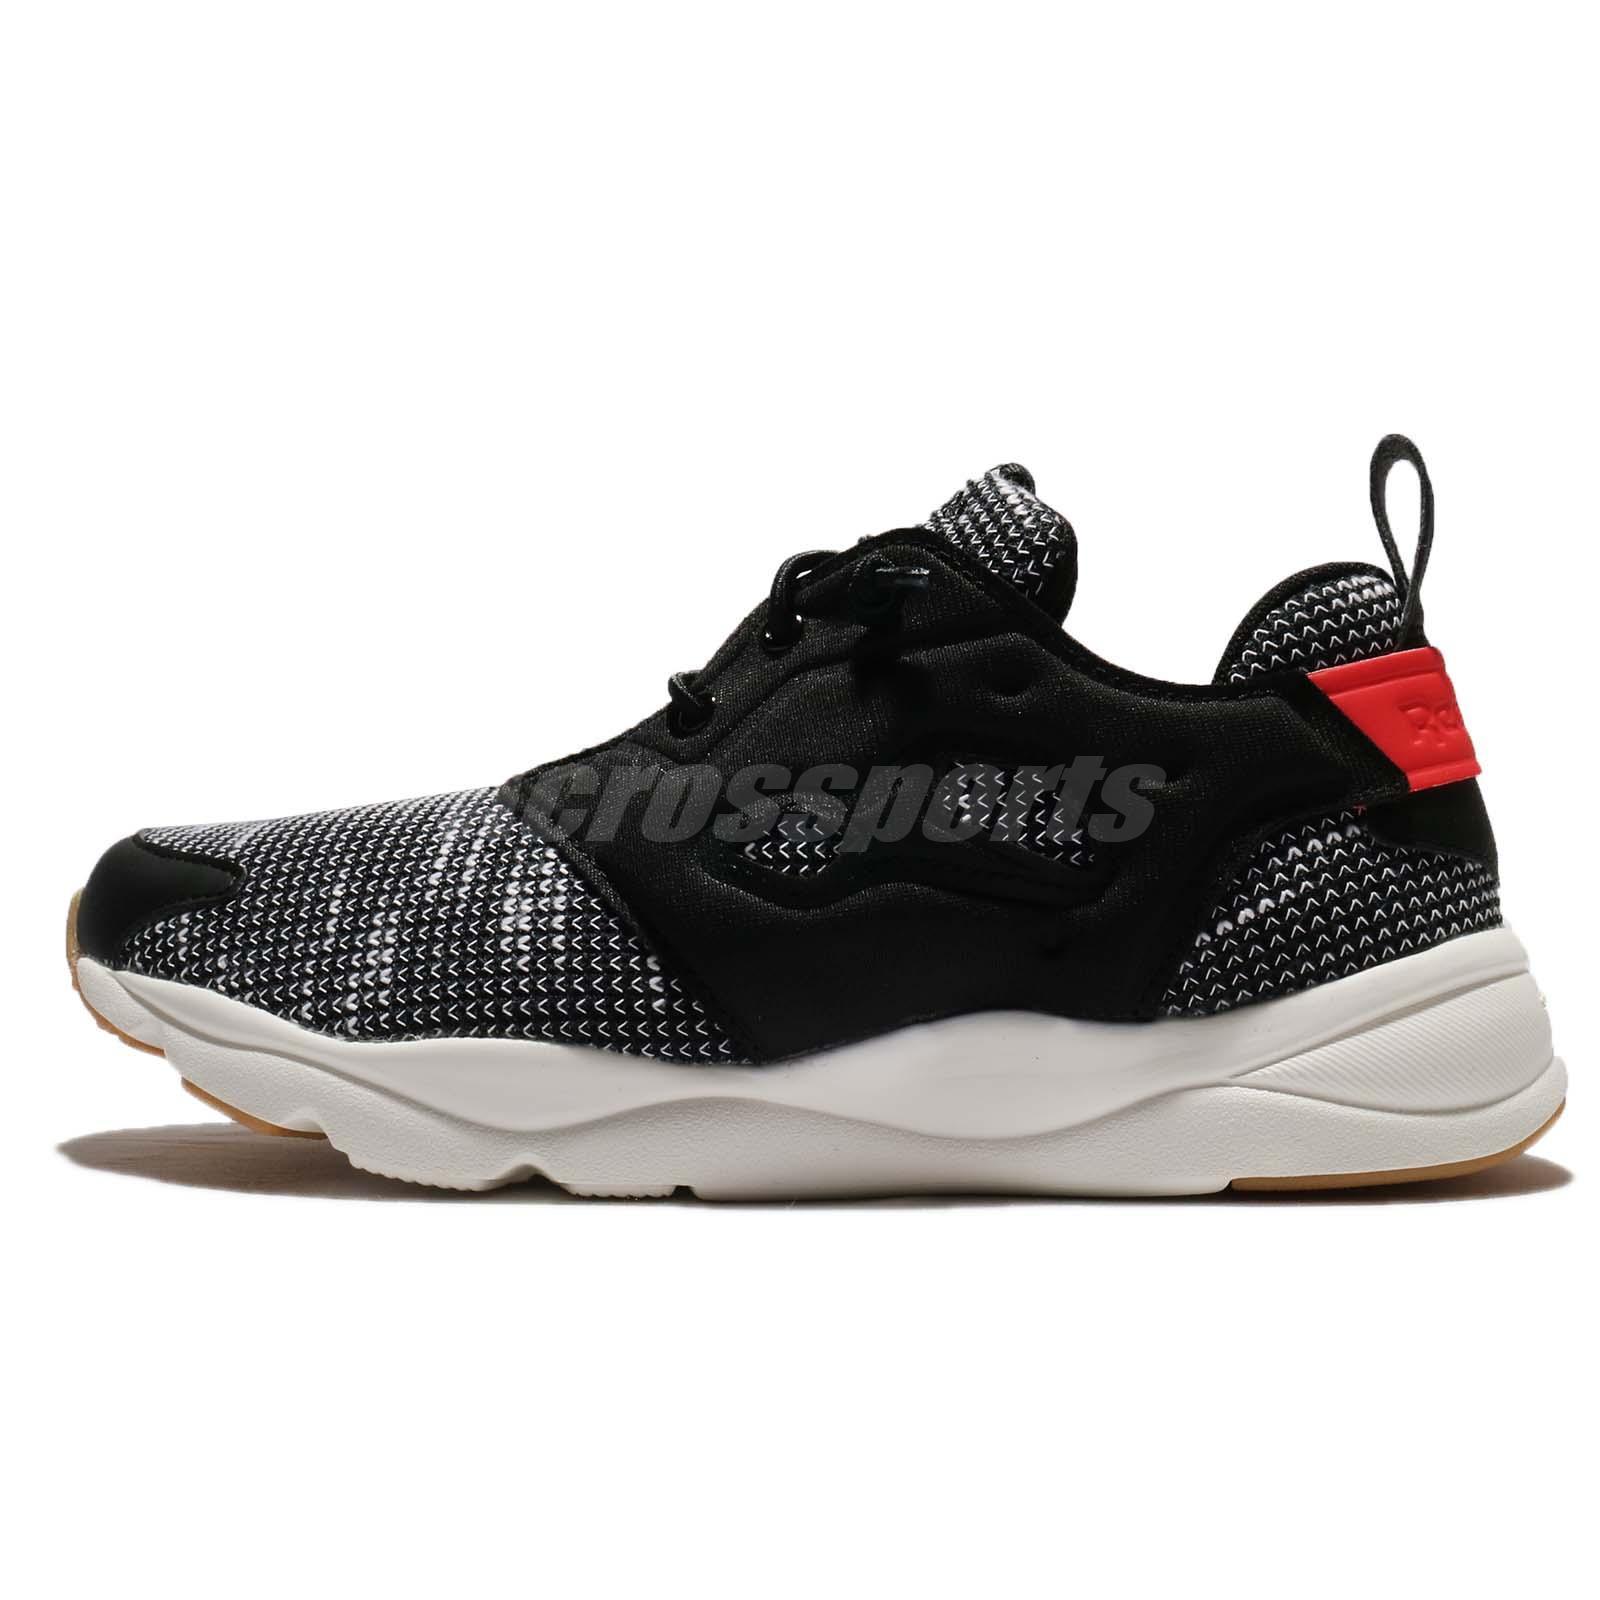 Reebok Furylite FBT Black Glow Red Chalk Women Running Shoes Sneakers BS6184 c7a0f9cd7